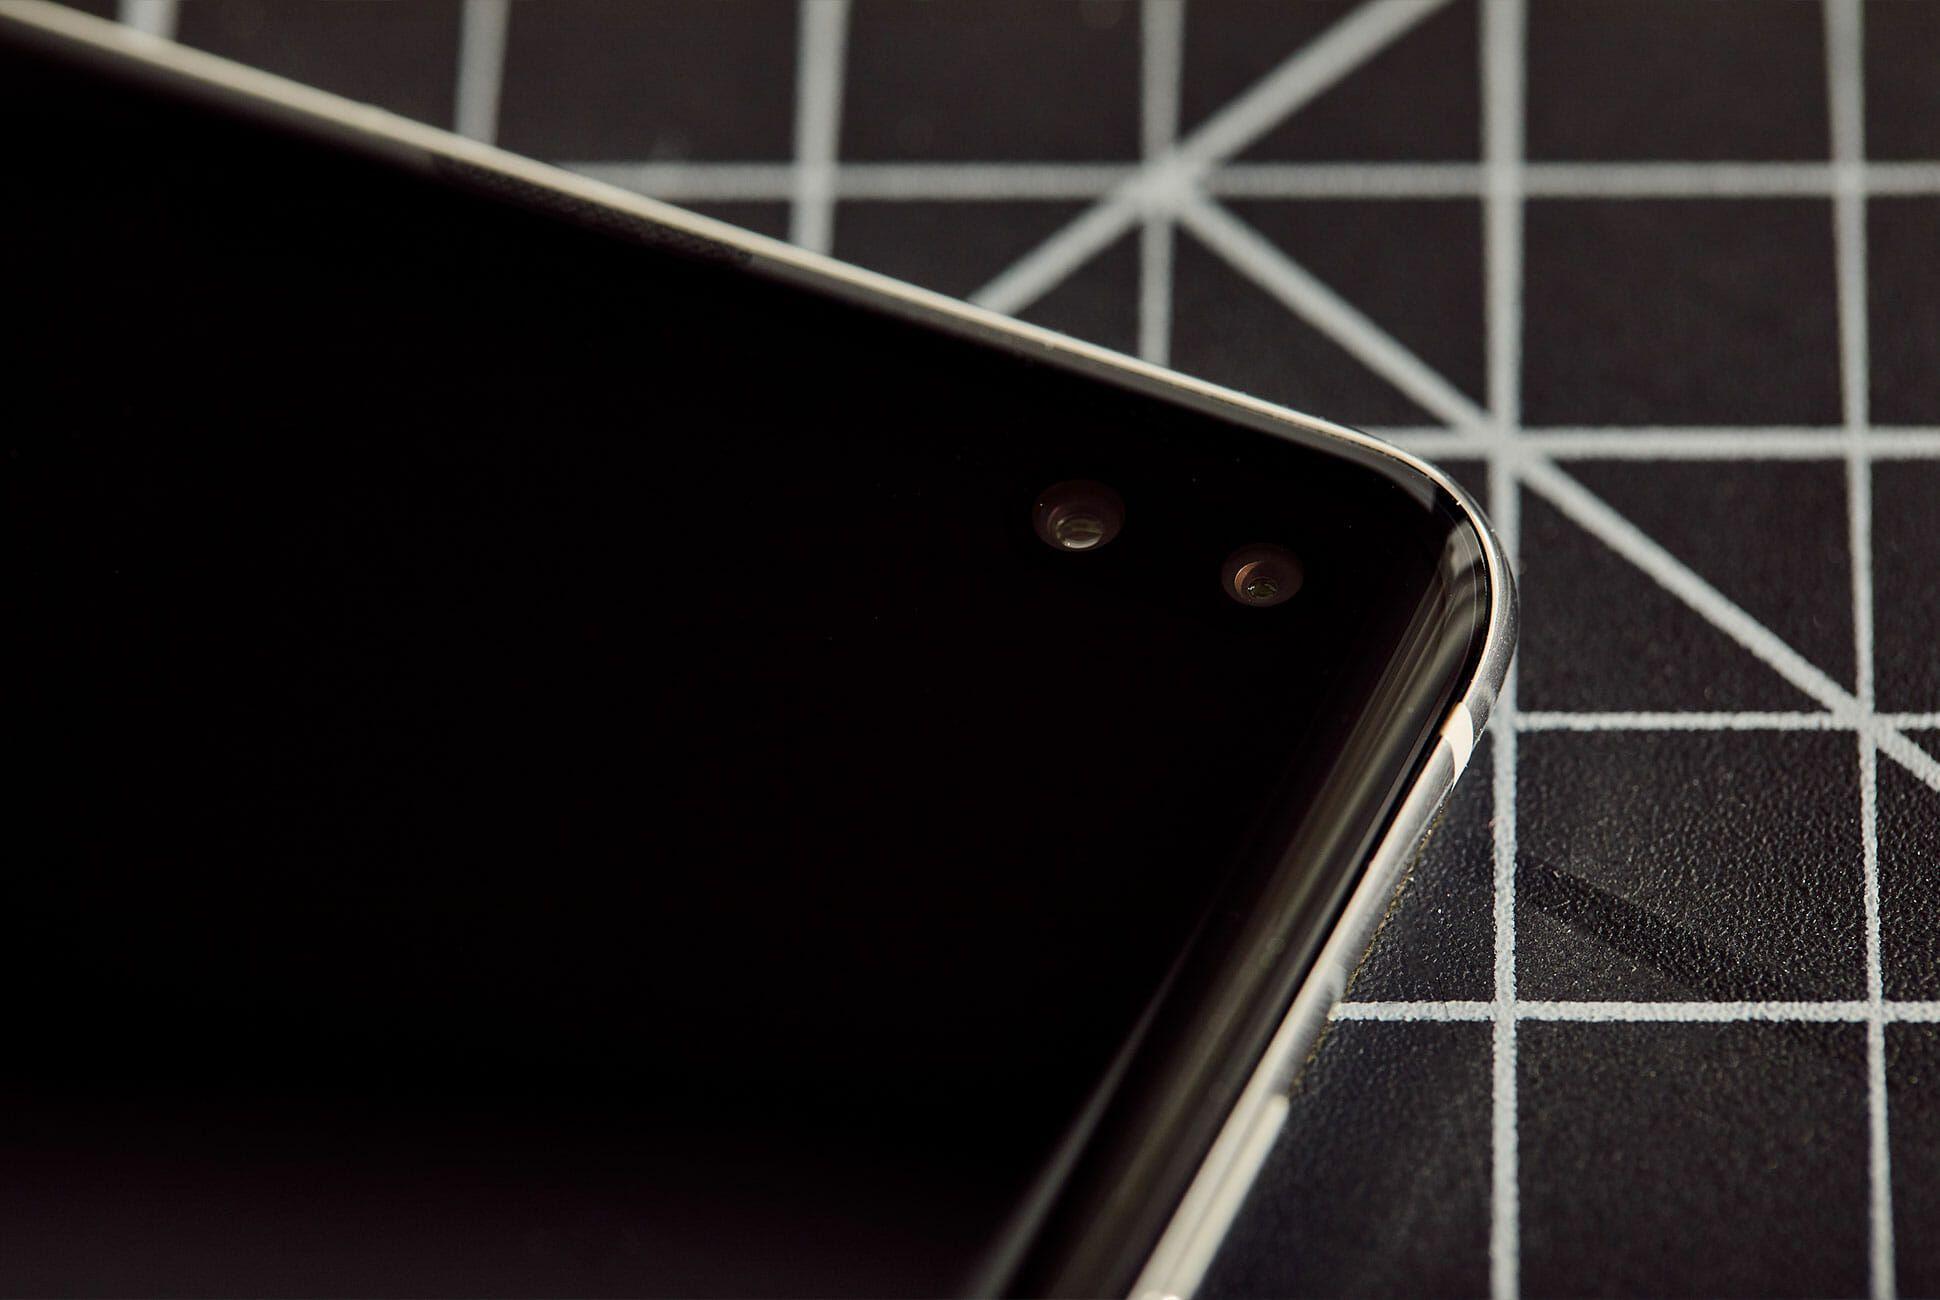 Galaxy-S10-Review-Gear-Patrol-Slide-5